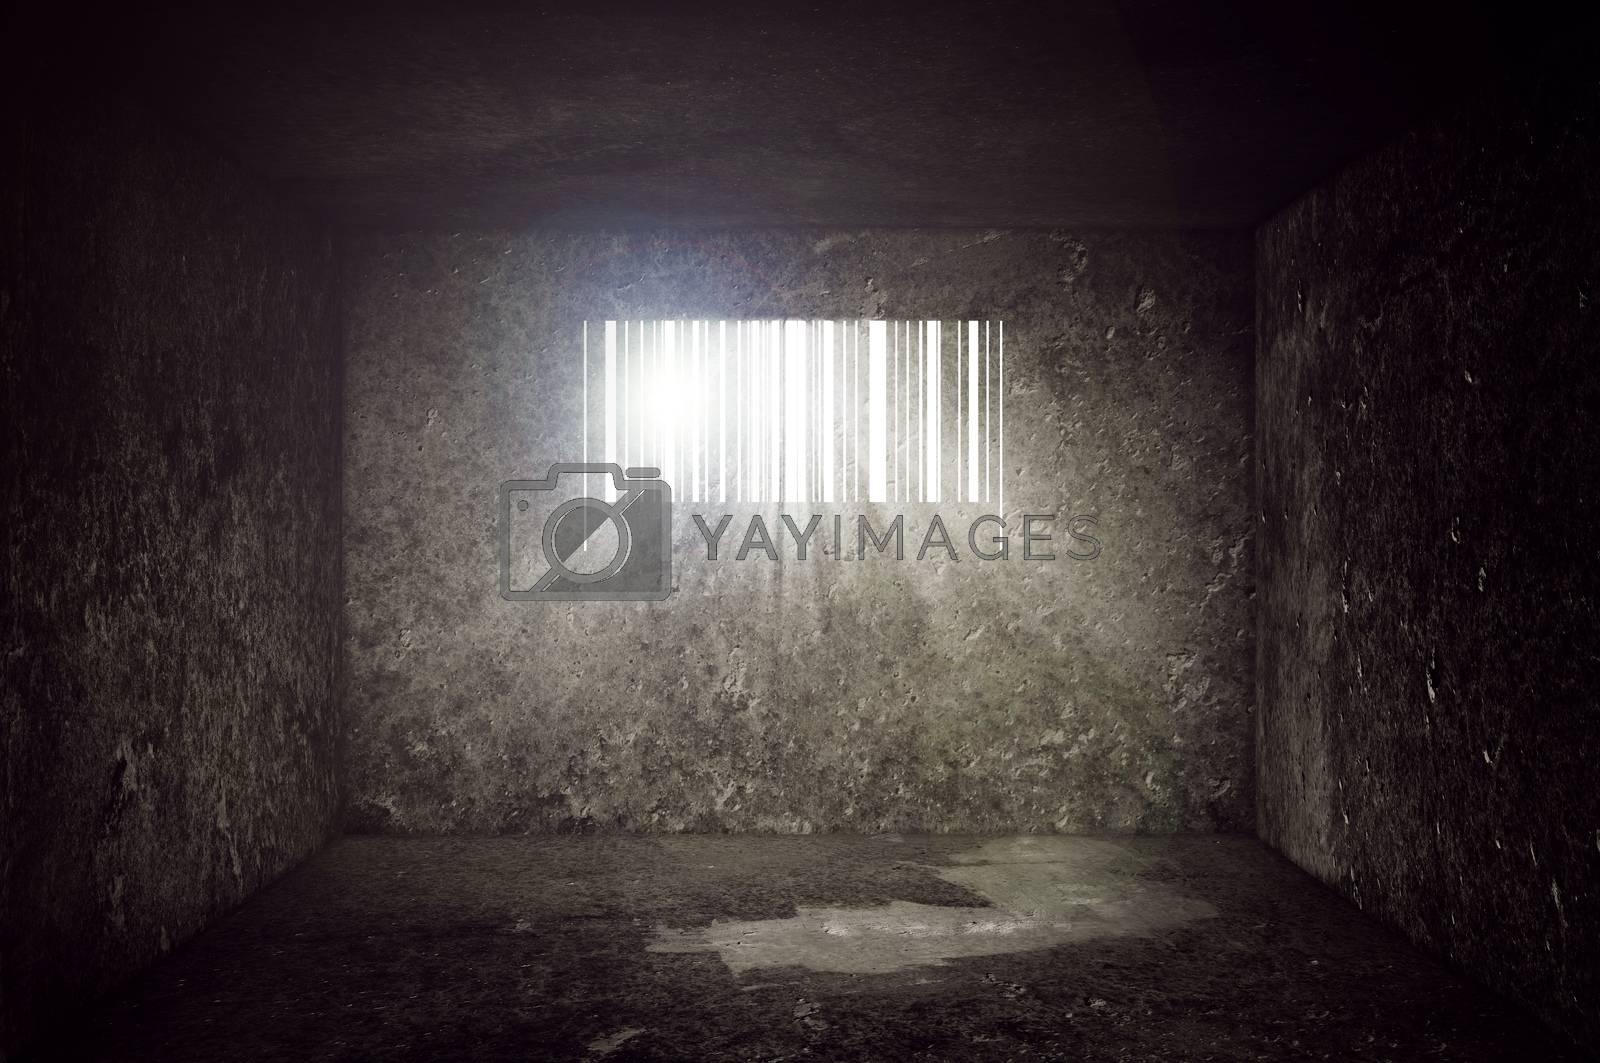 Compulsive Consumerism Concept, Empty Concrete Prison Cell with Barcode shaped Window. Sun rays and sun flare through the prison bars.